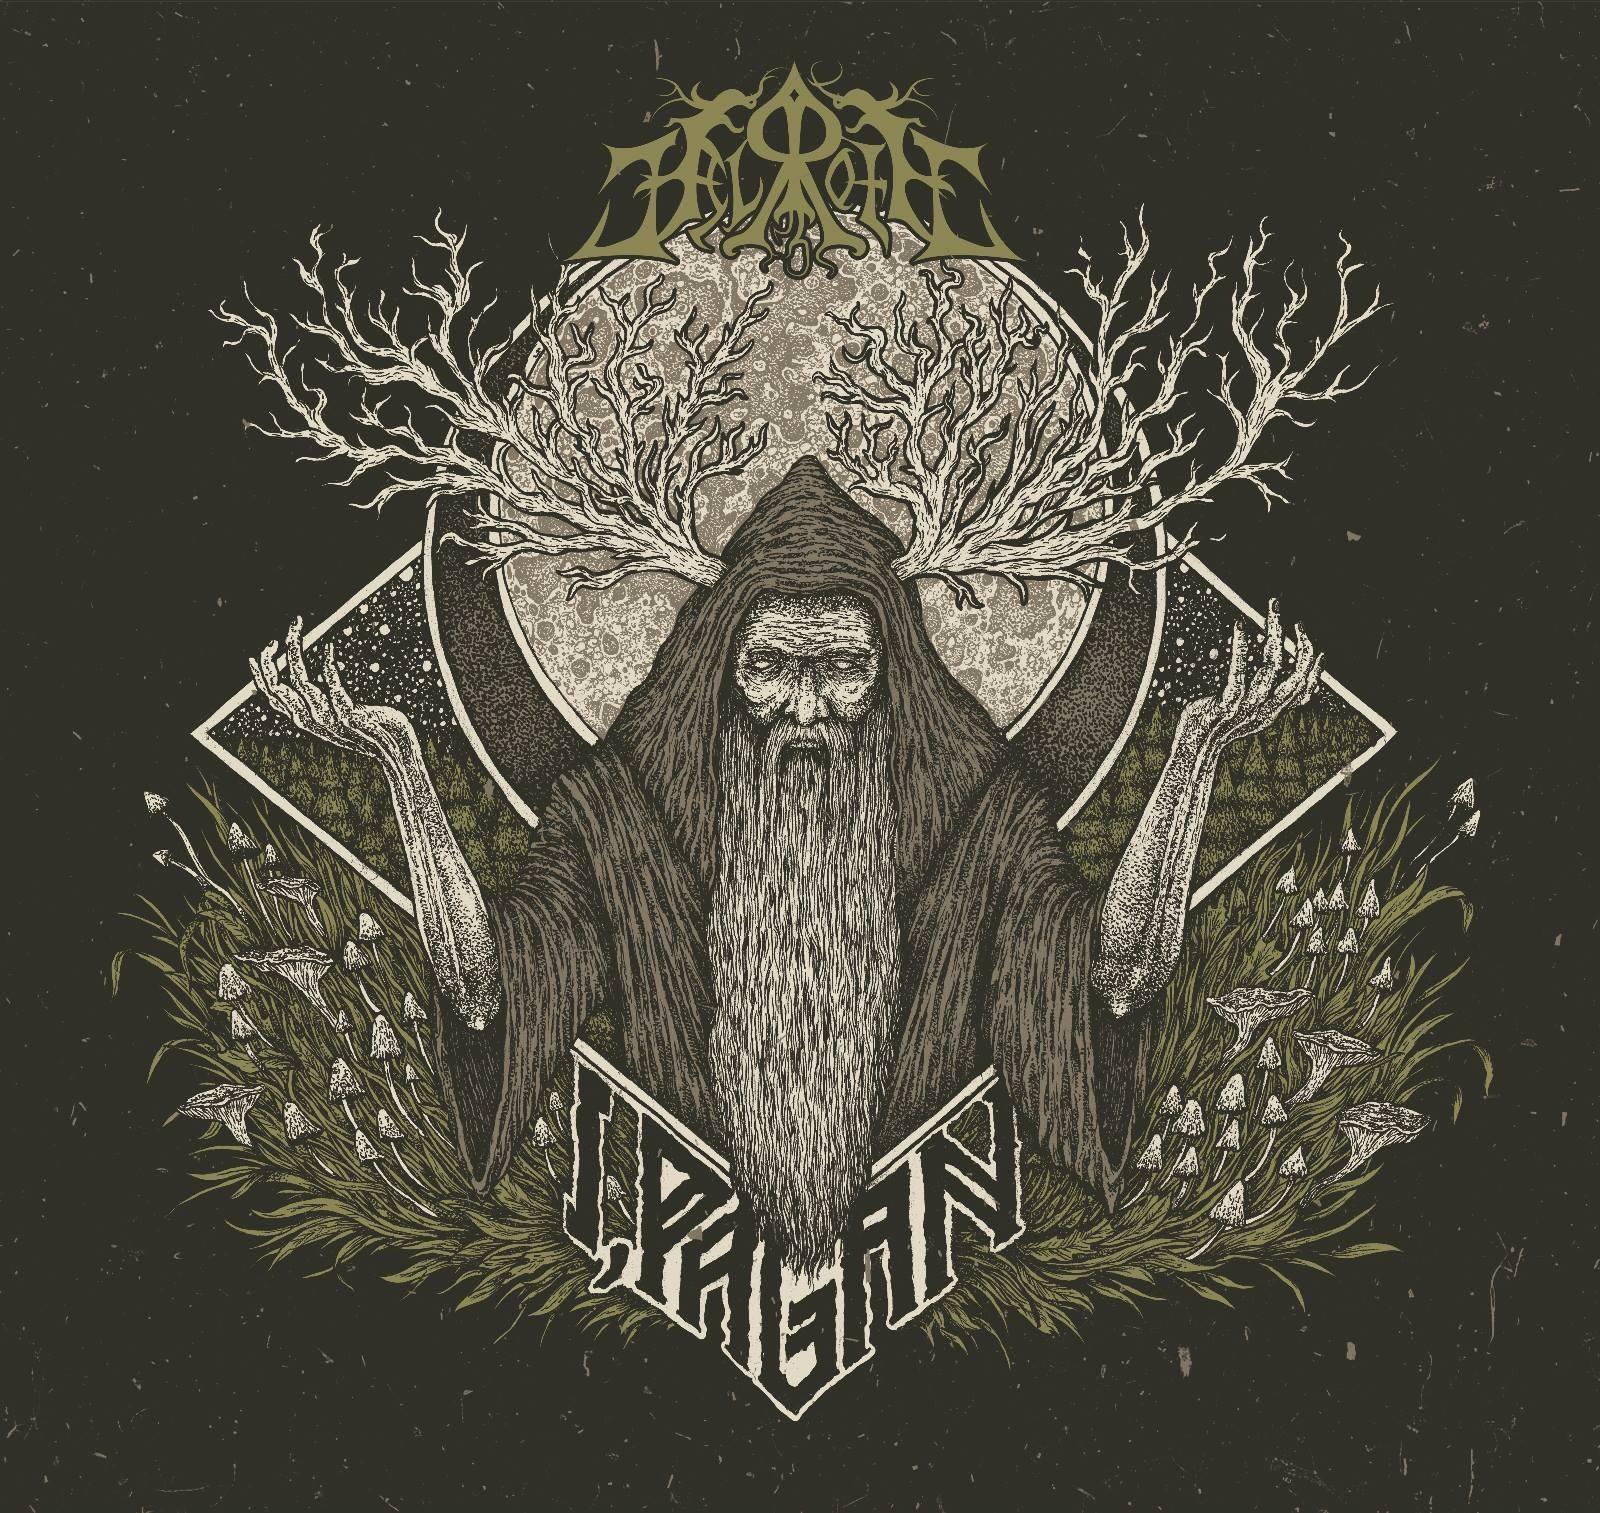 Helroth - I, Pagan